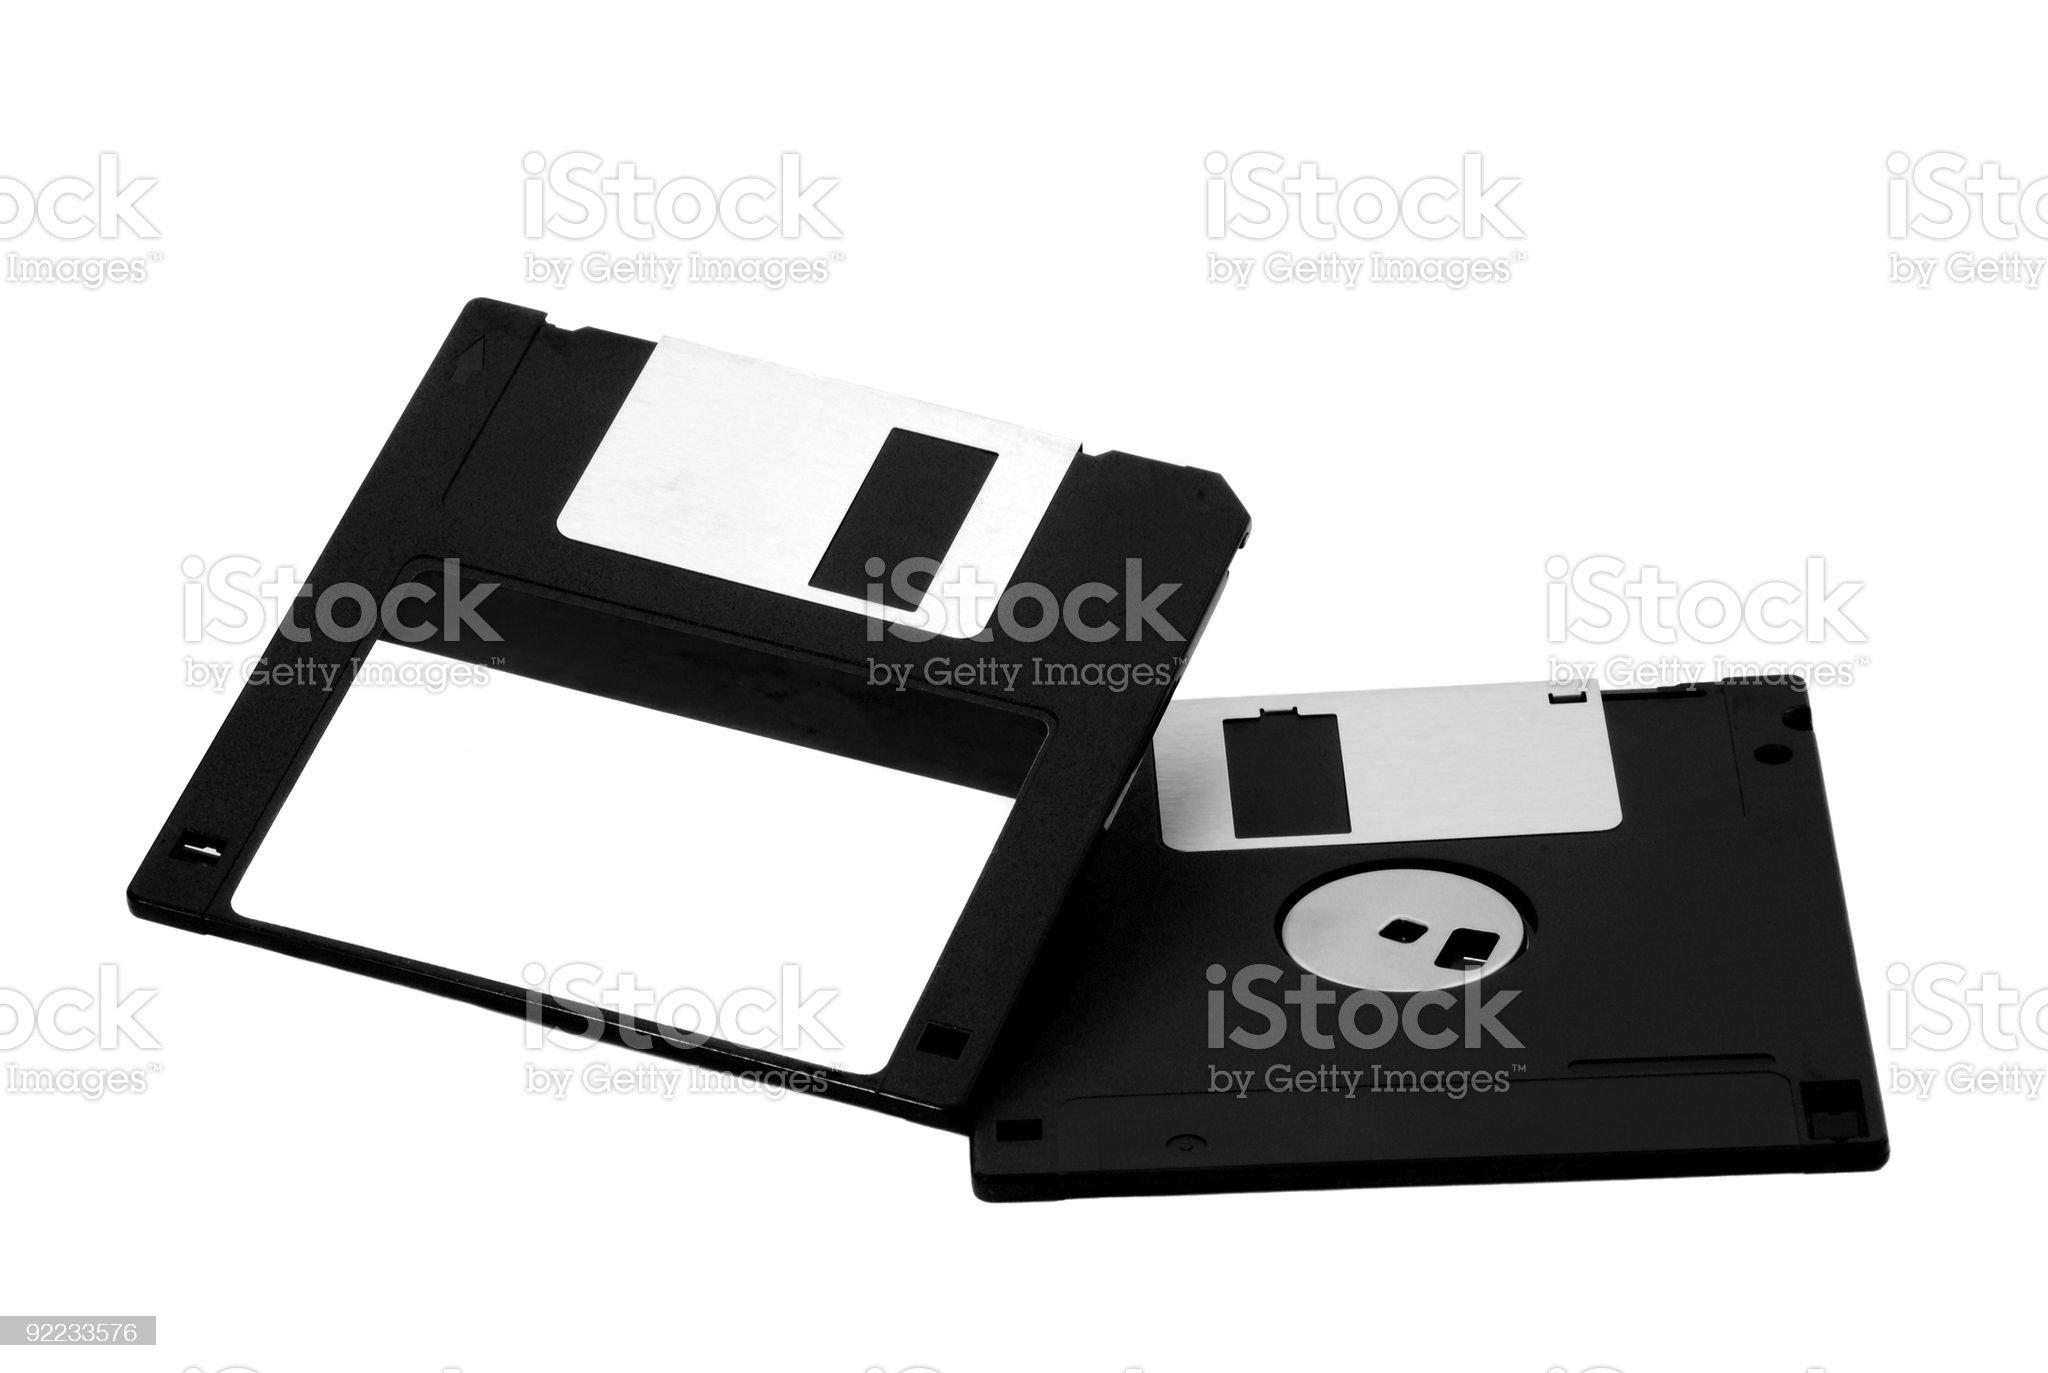 Diskette floppy disk royalty-free stock photo